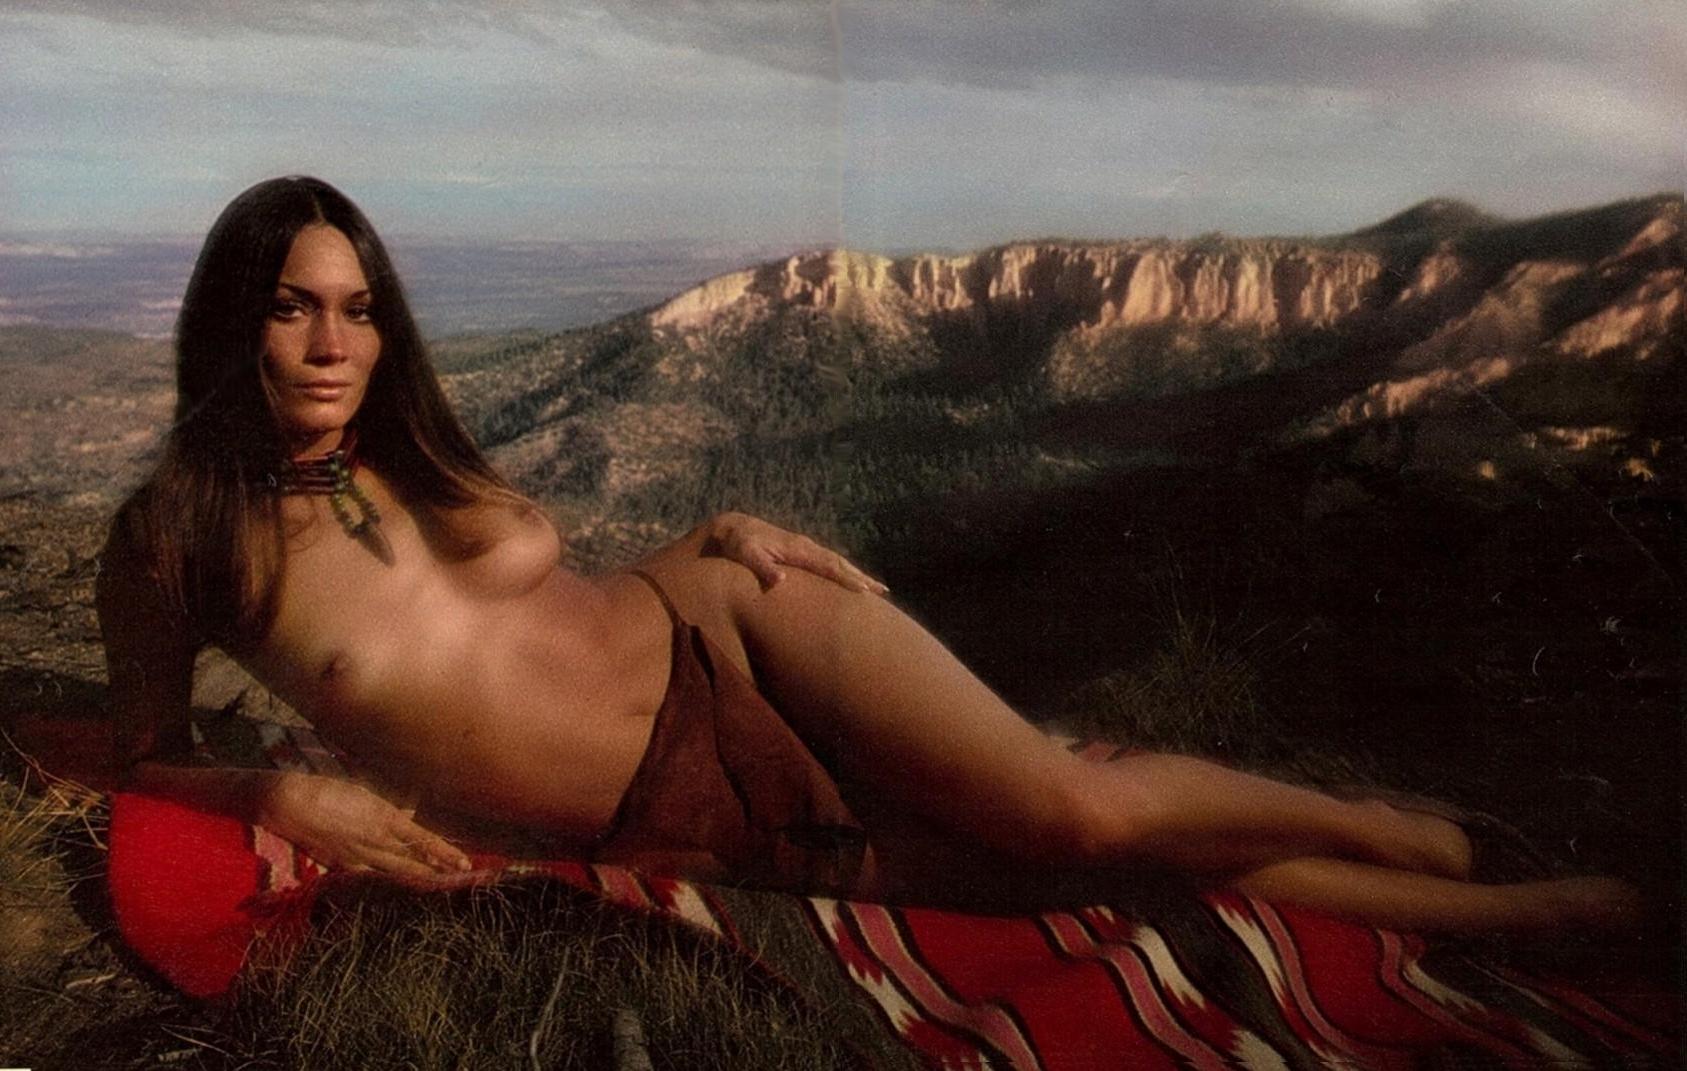 Barbara eden nude, topless pictures, playboy photos, sex scene uncensored